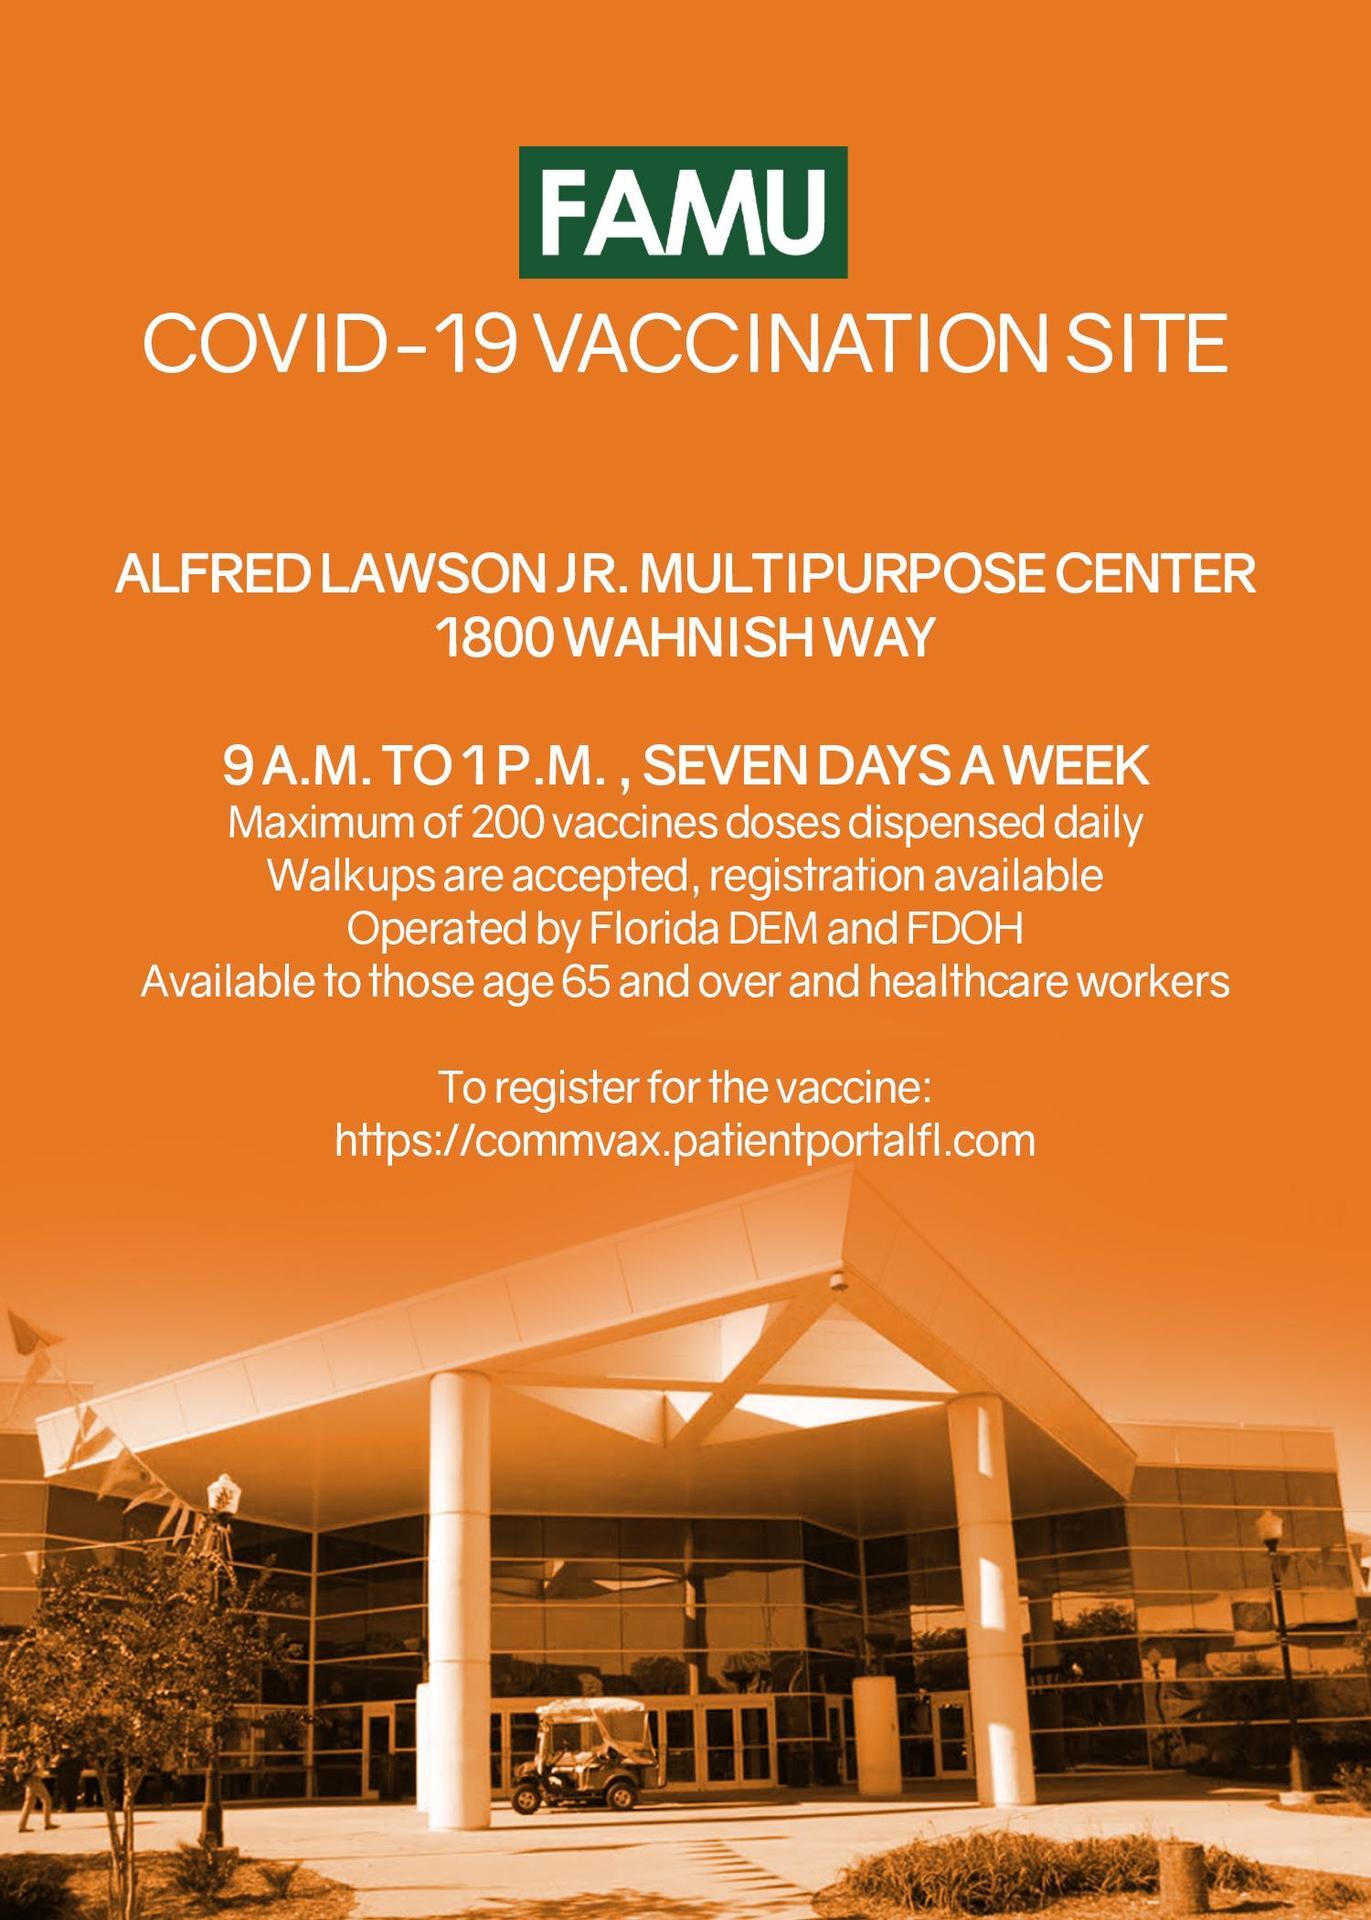 FAMU Vaccination Site Flyer